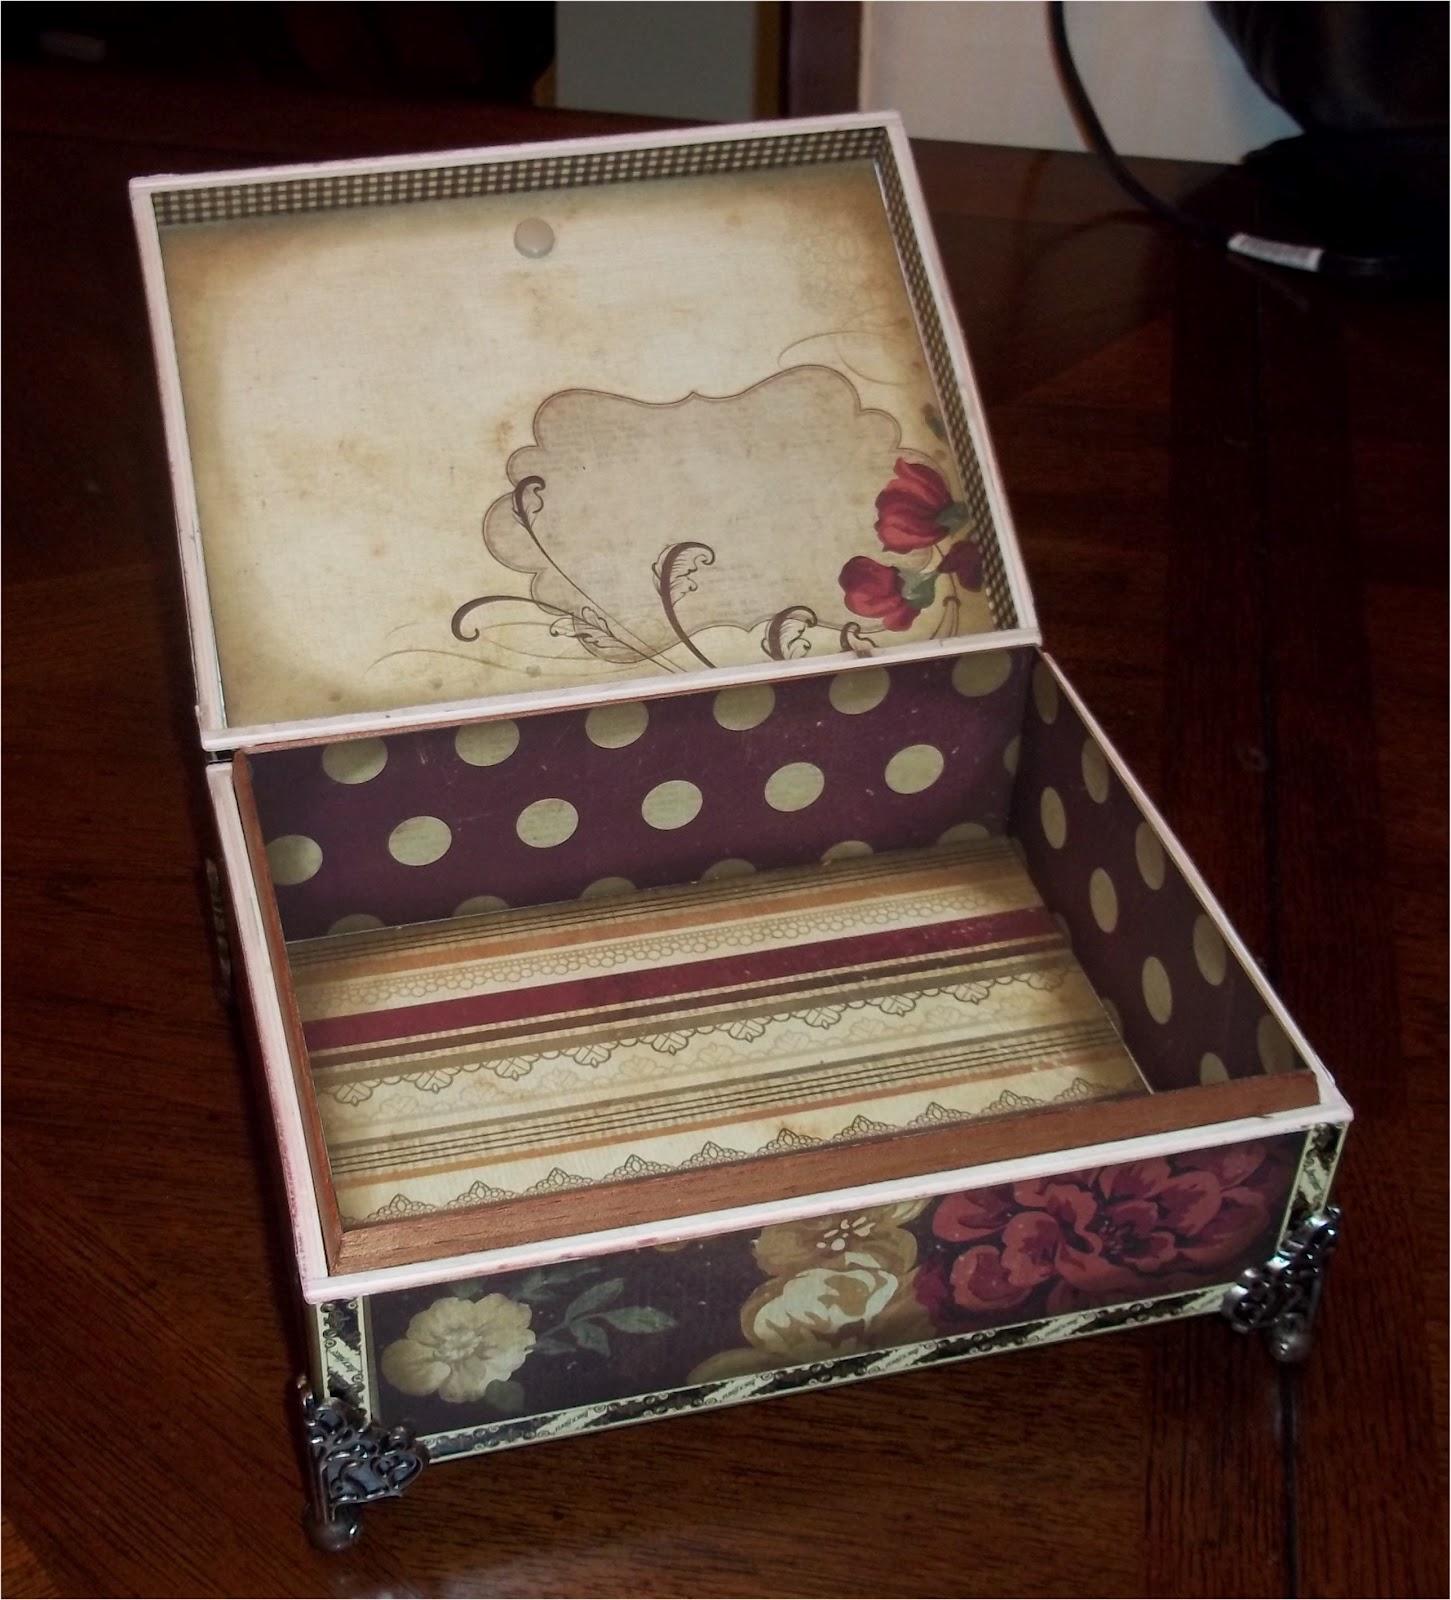 Paper paws etc decorative cigar box 4 for Cardboard cigar box crafts